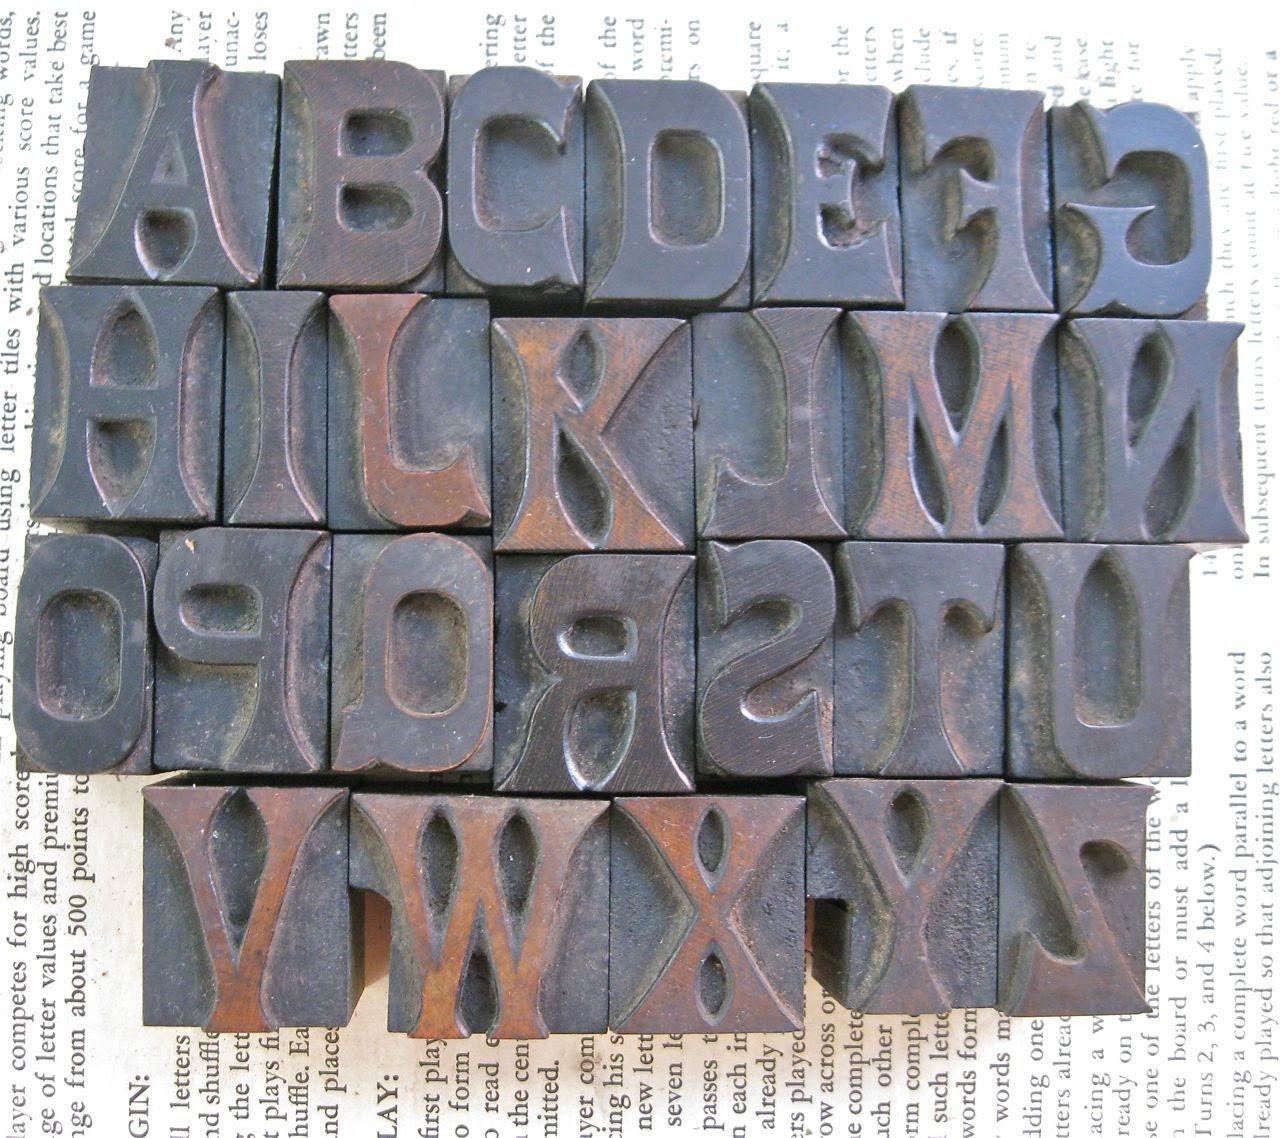 Vintage Letterpress -Complete Alphabet - 26 Letters